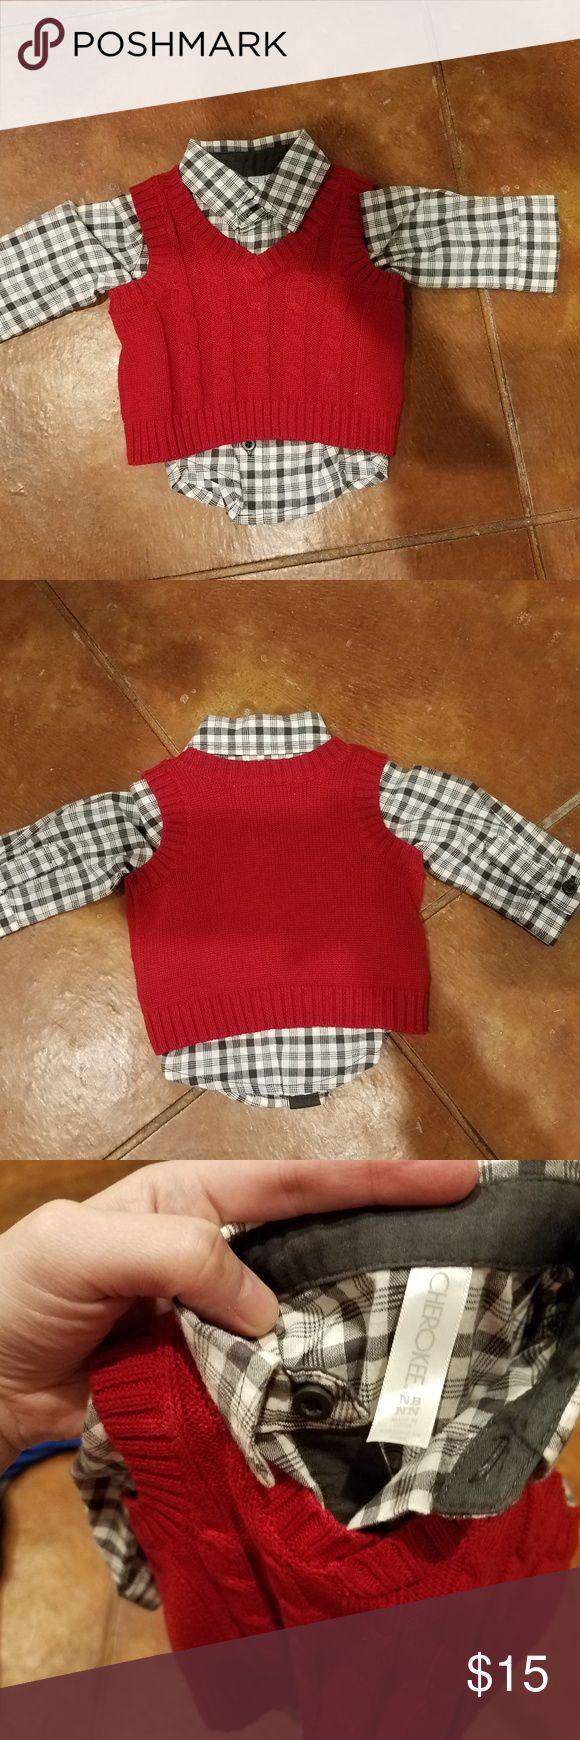 Cherokee newborn vest and shirt set Adorable Cherokee brand vest and shirt set in NB size. Worn once, so like new. Perfect for newborn photos! Cherokee Shirts & Tops